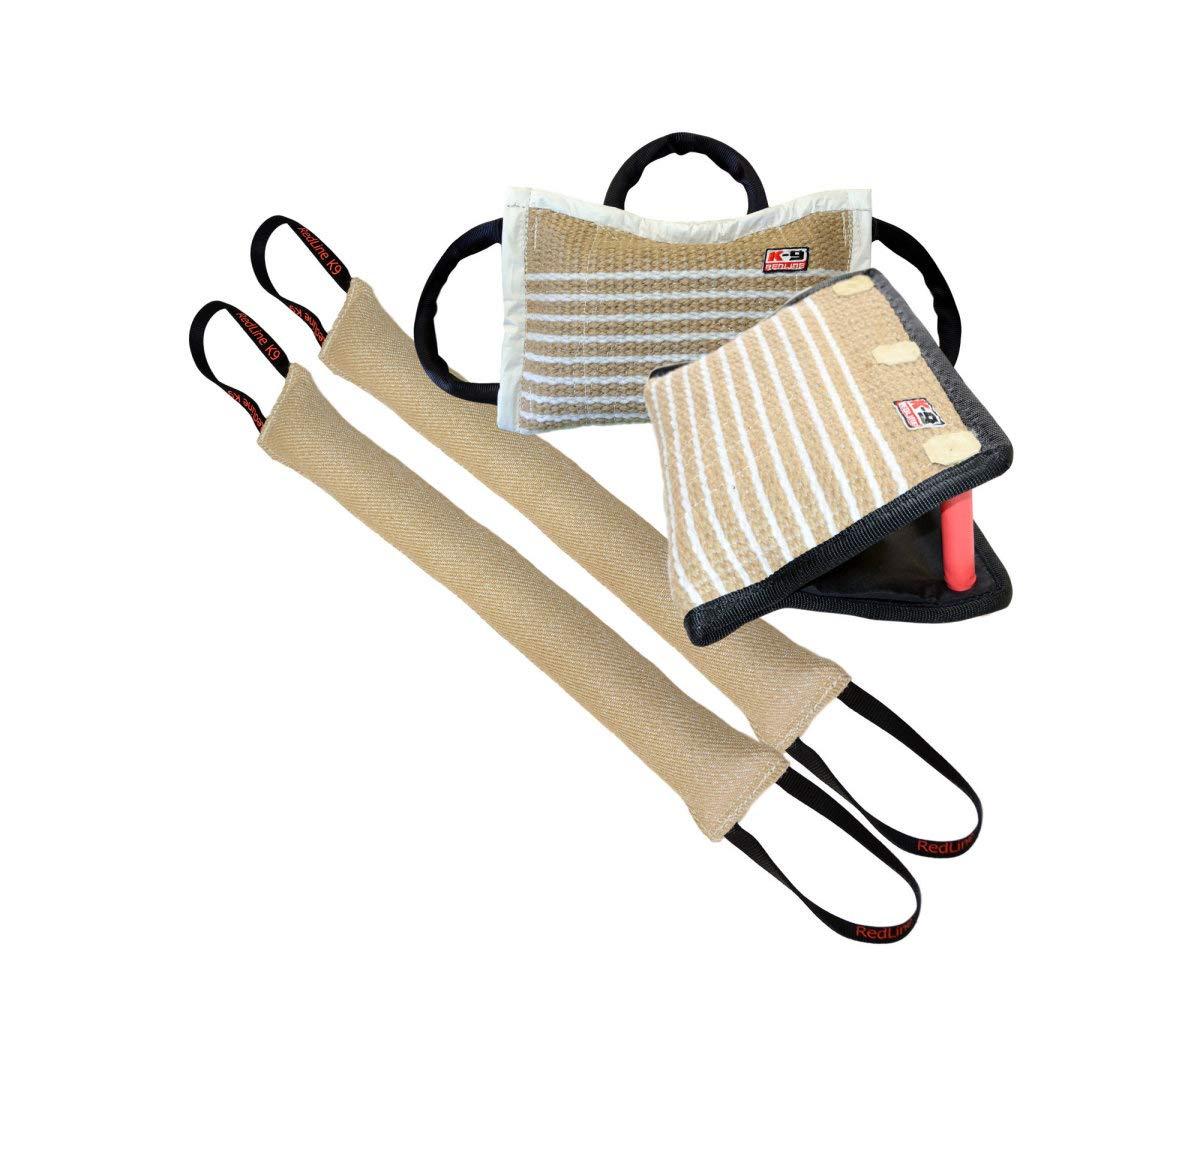 Bundle - 1-3 Handle Firm Jute Bite Pillow, 1-3 Handle Jute Bite Wedge, 2-4'' X 24'' 2 Handle Jute Tug Toy - Redline K9 by REDLINE K-9